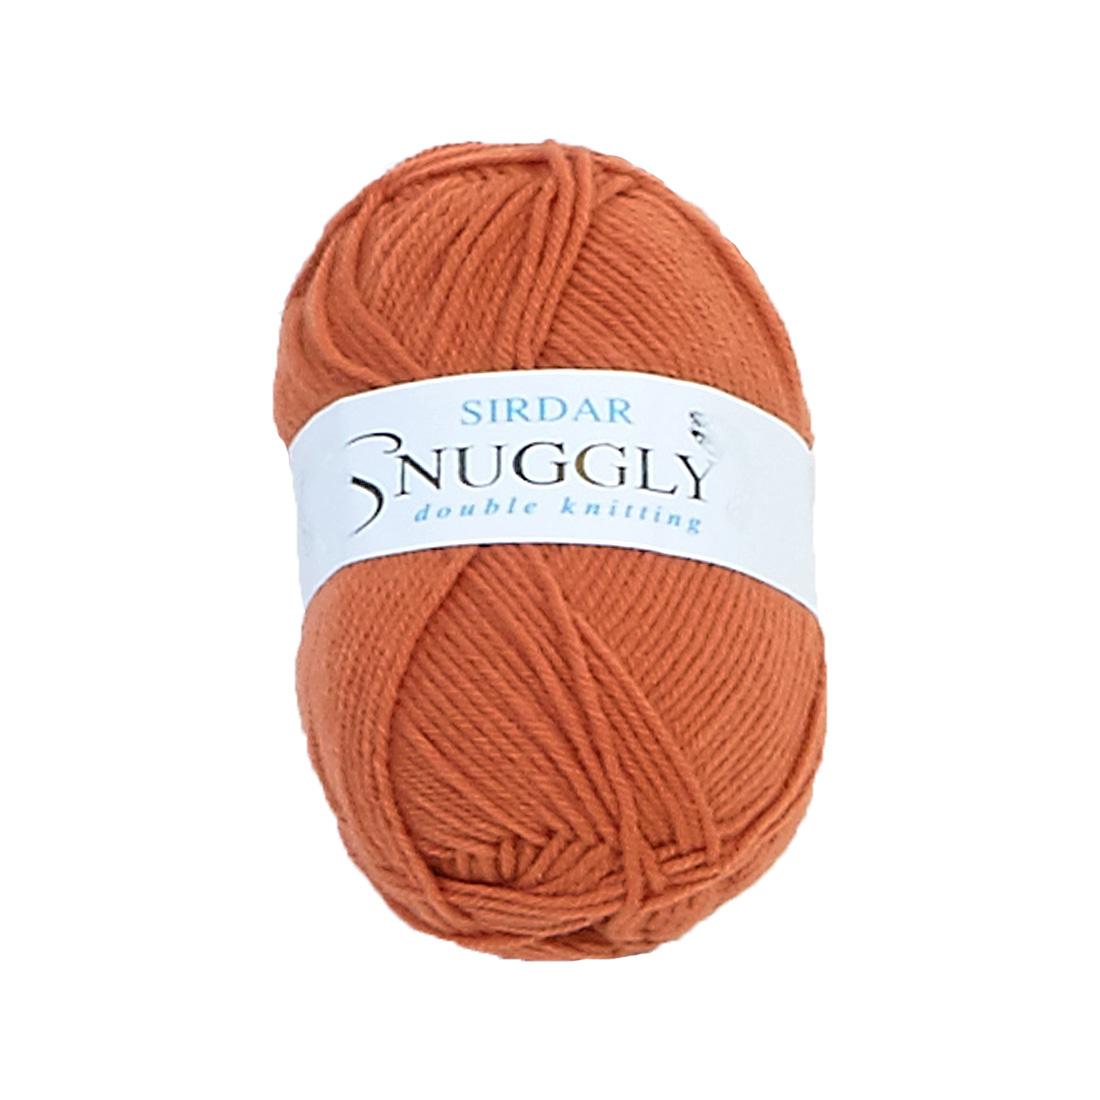 Snuggly DK 50g 0458